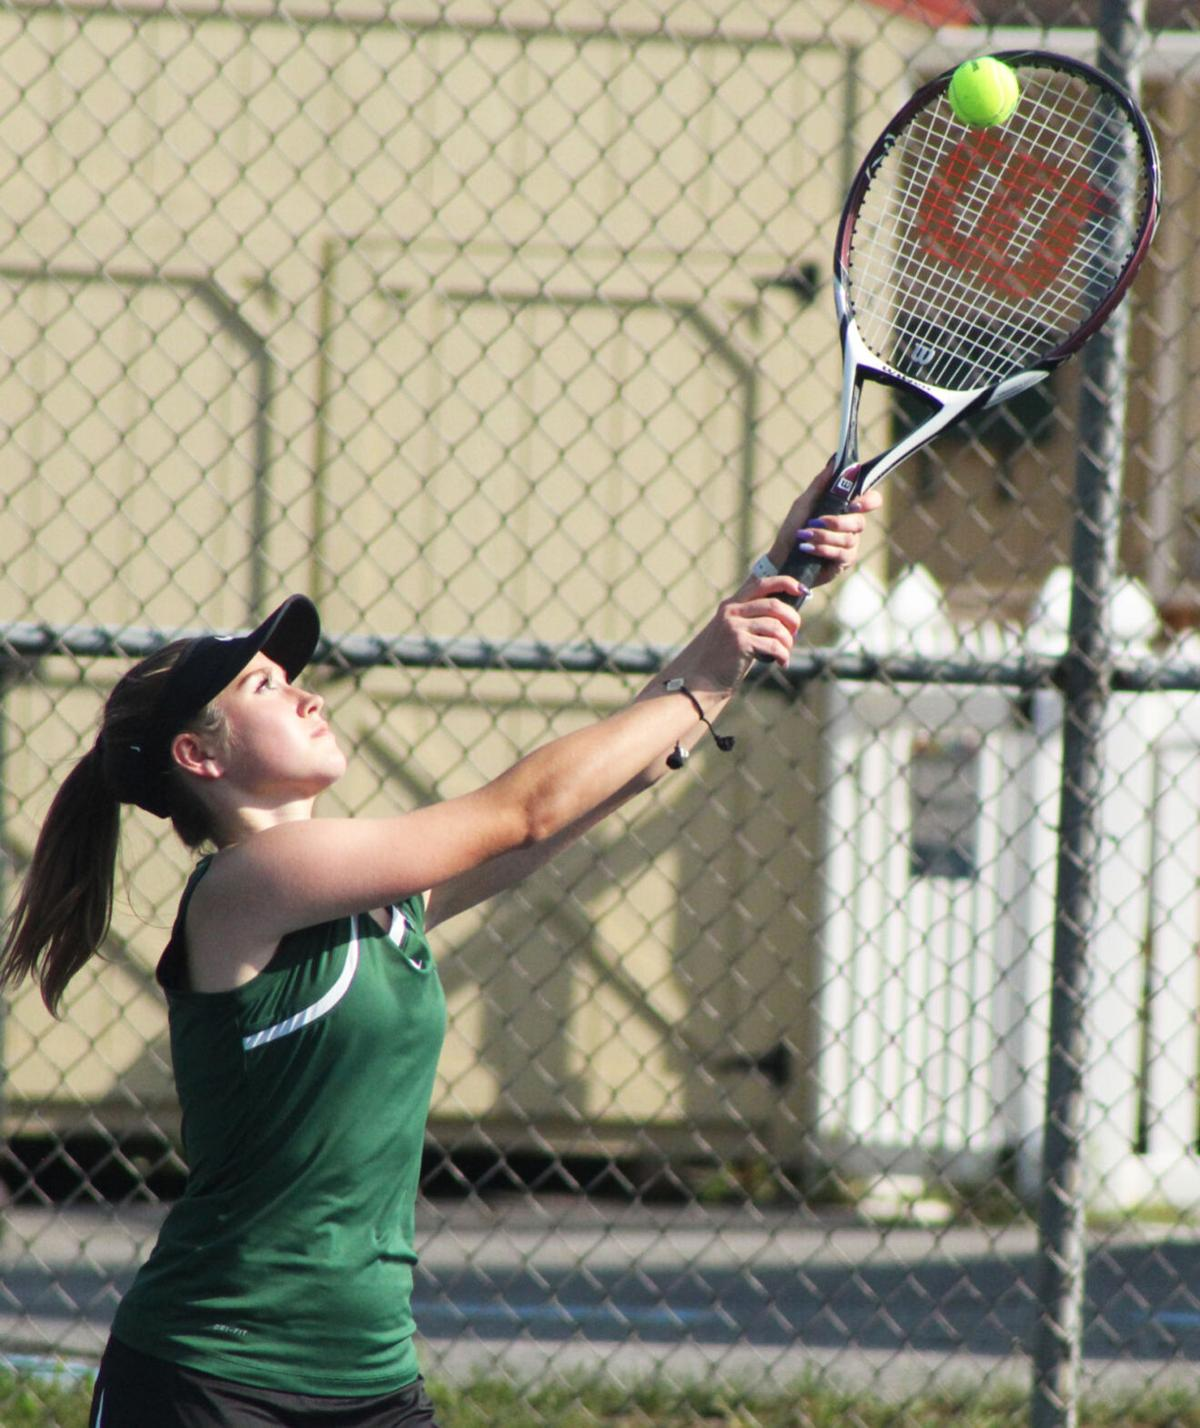 Wellsboro tennis player returns the ball